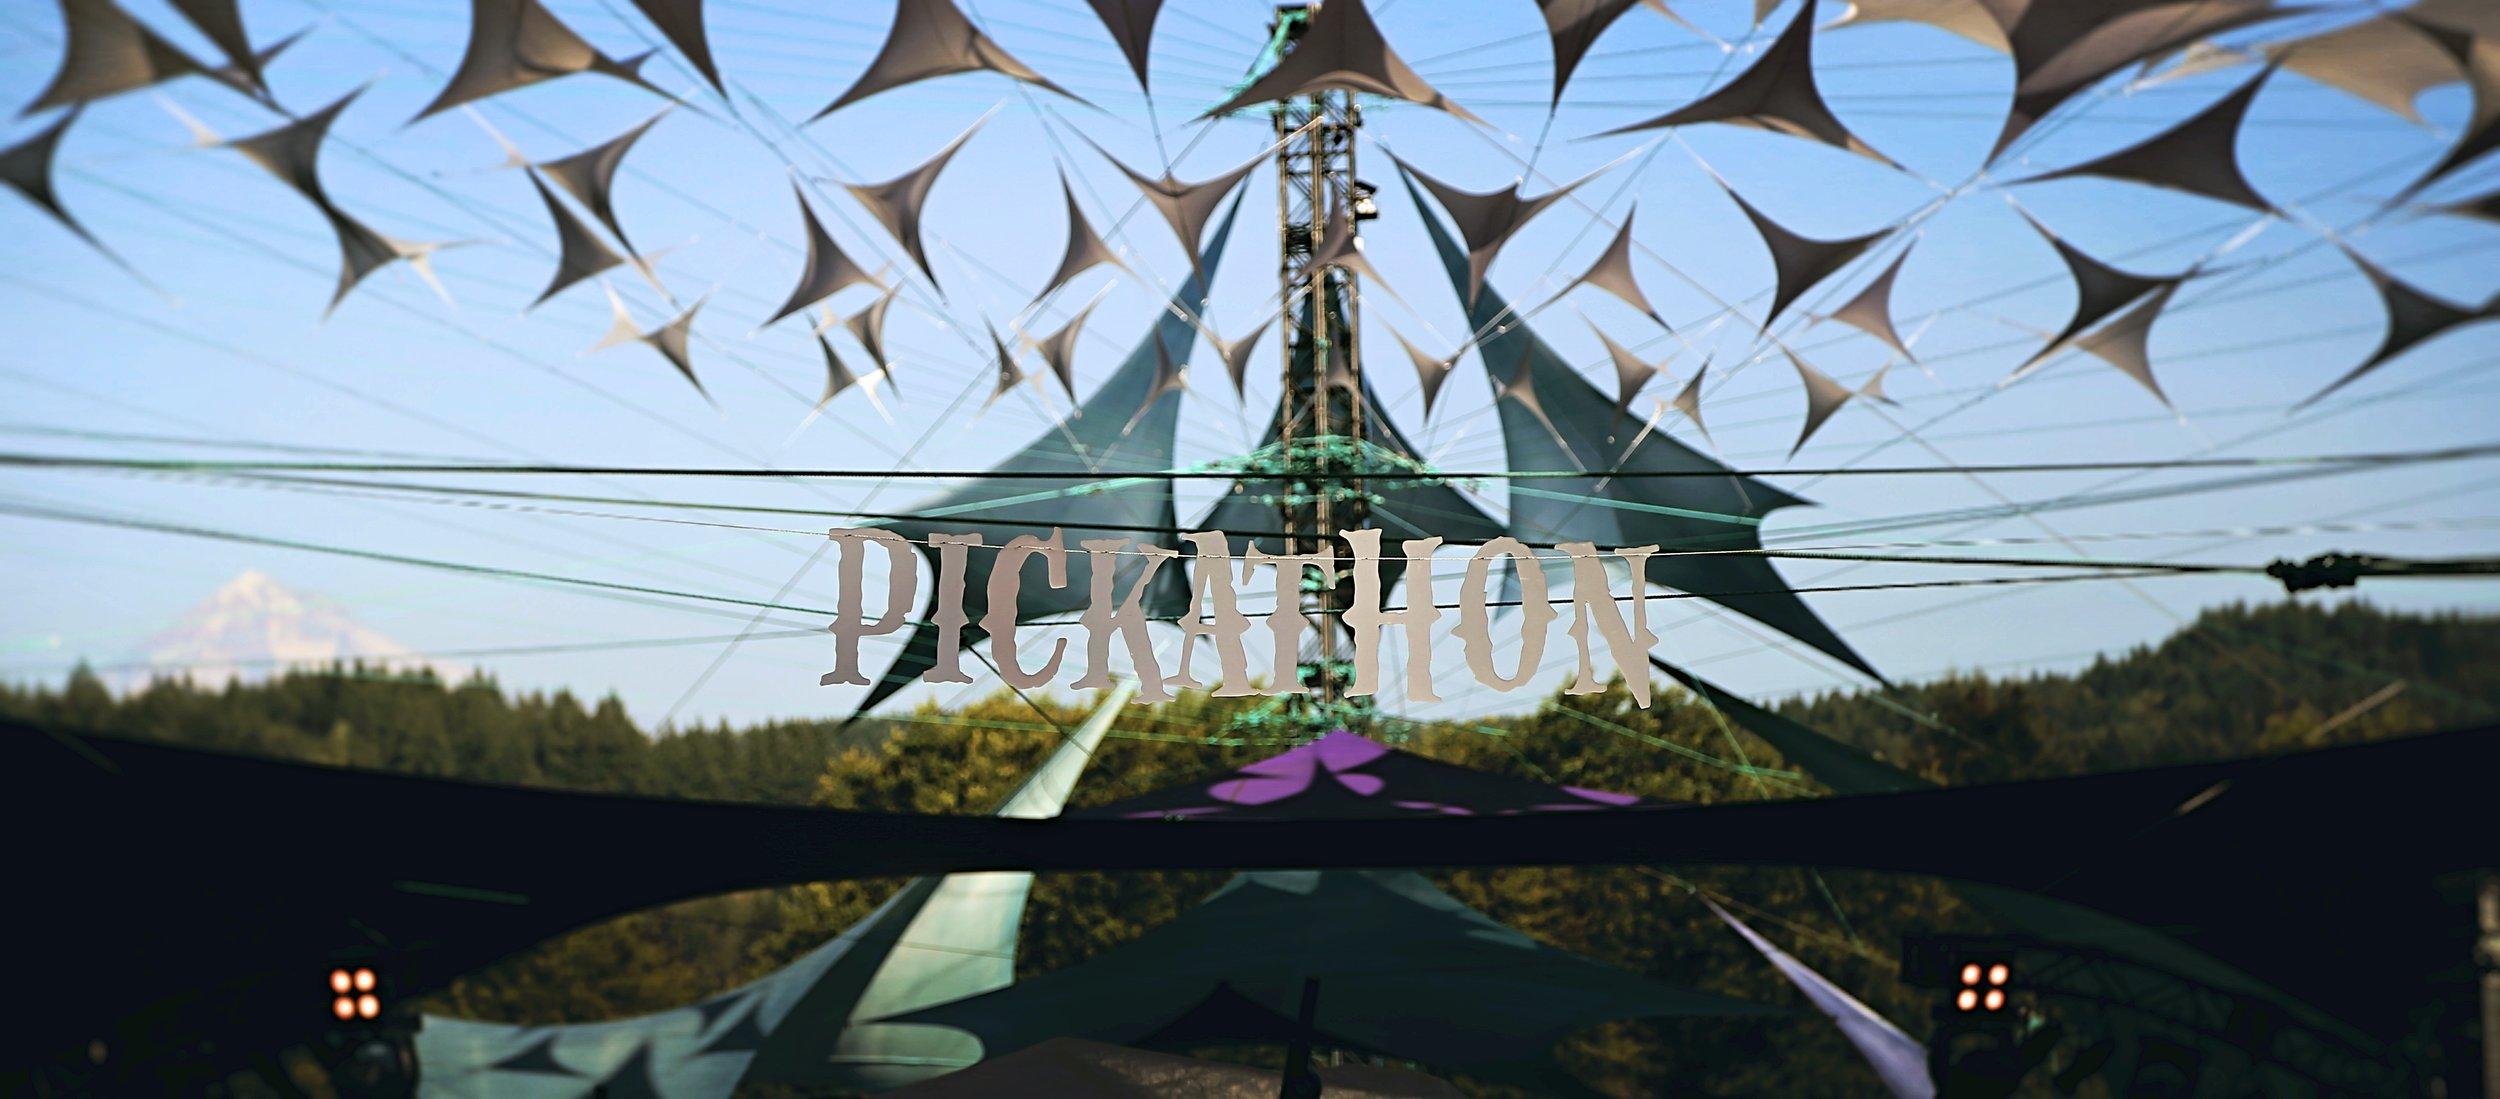 pickathon (3).jpg